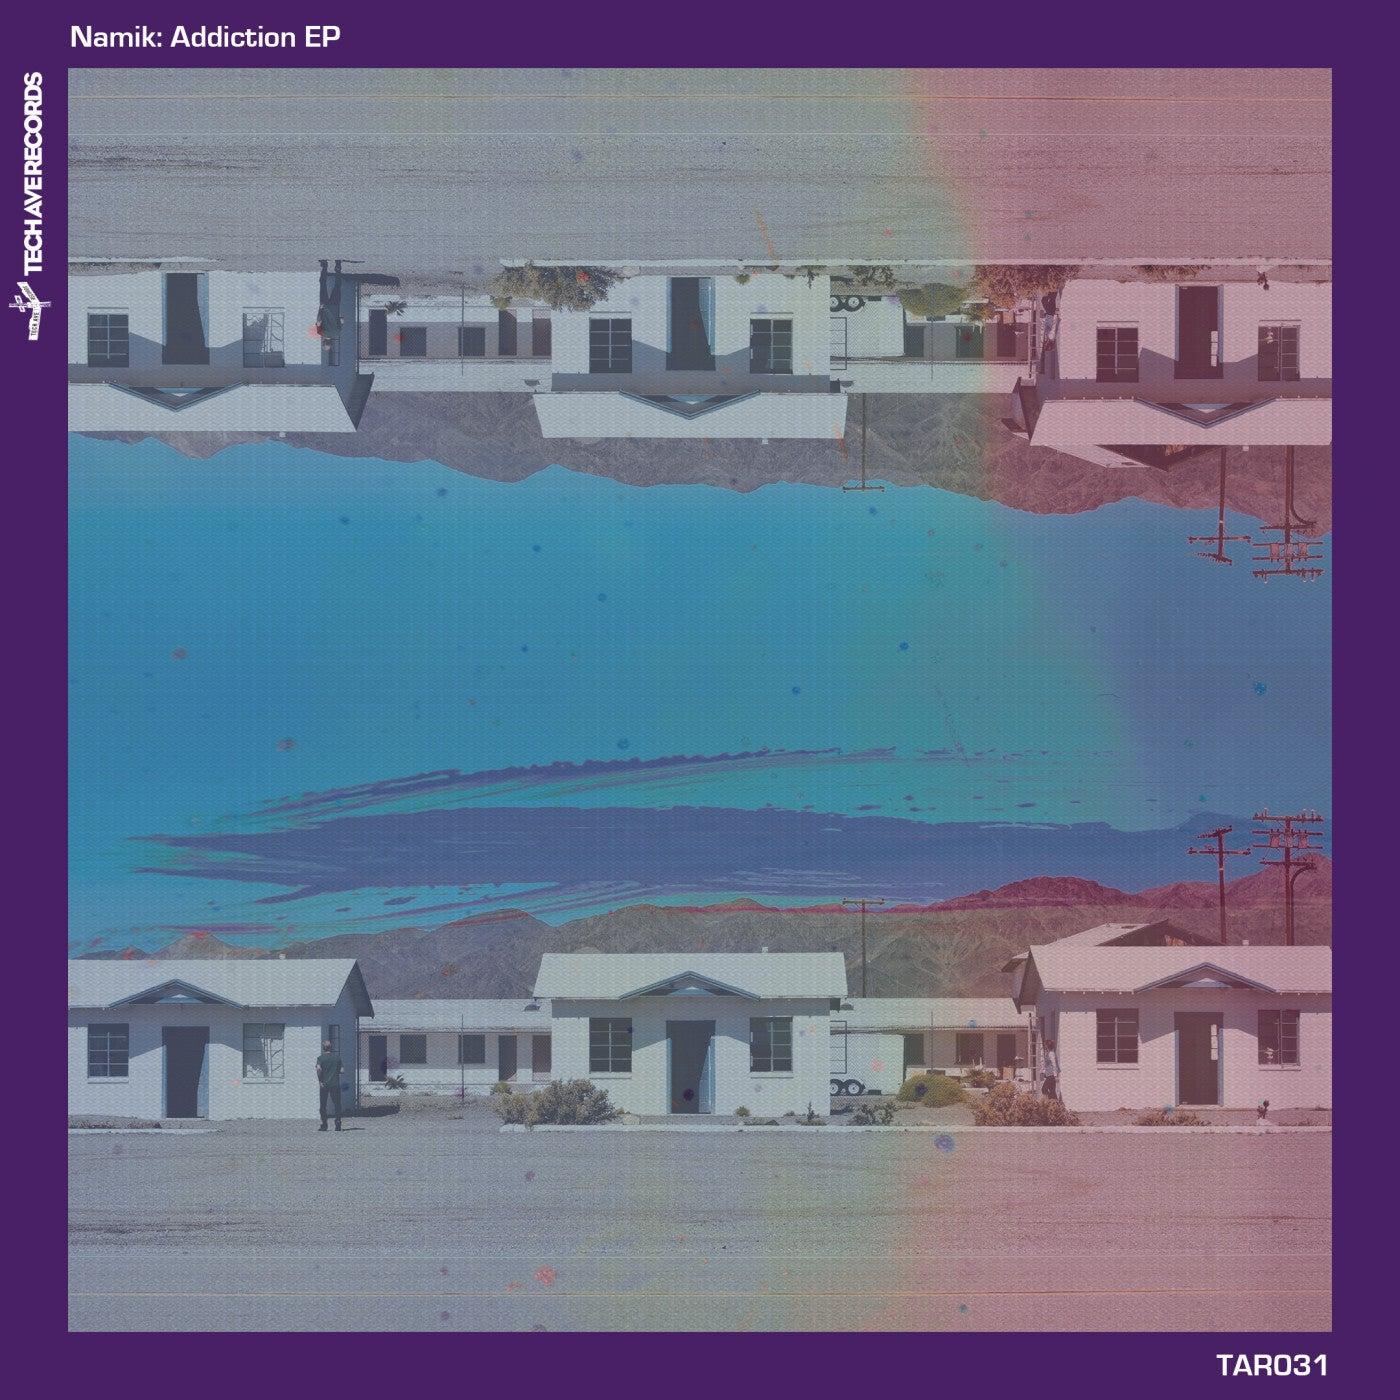 Namik: Addiction EP on Tech Avenue Records Image